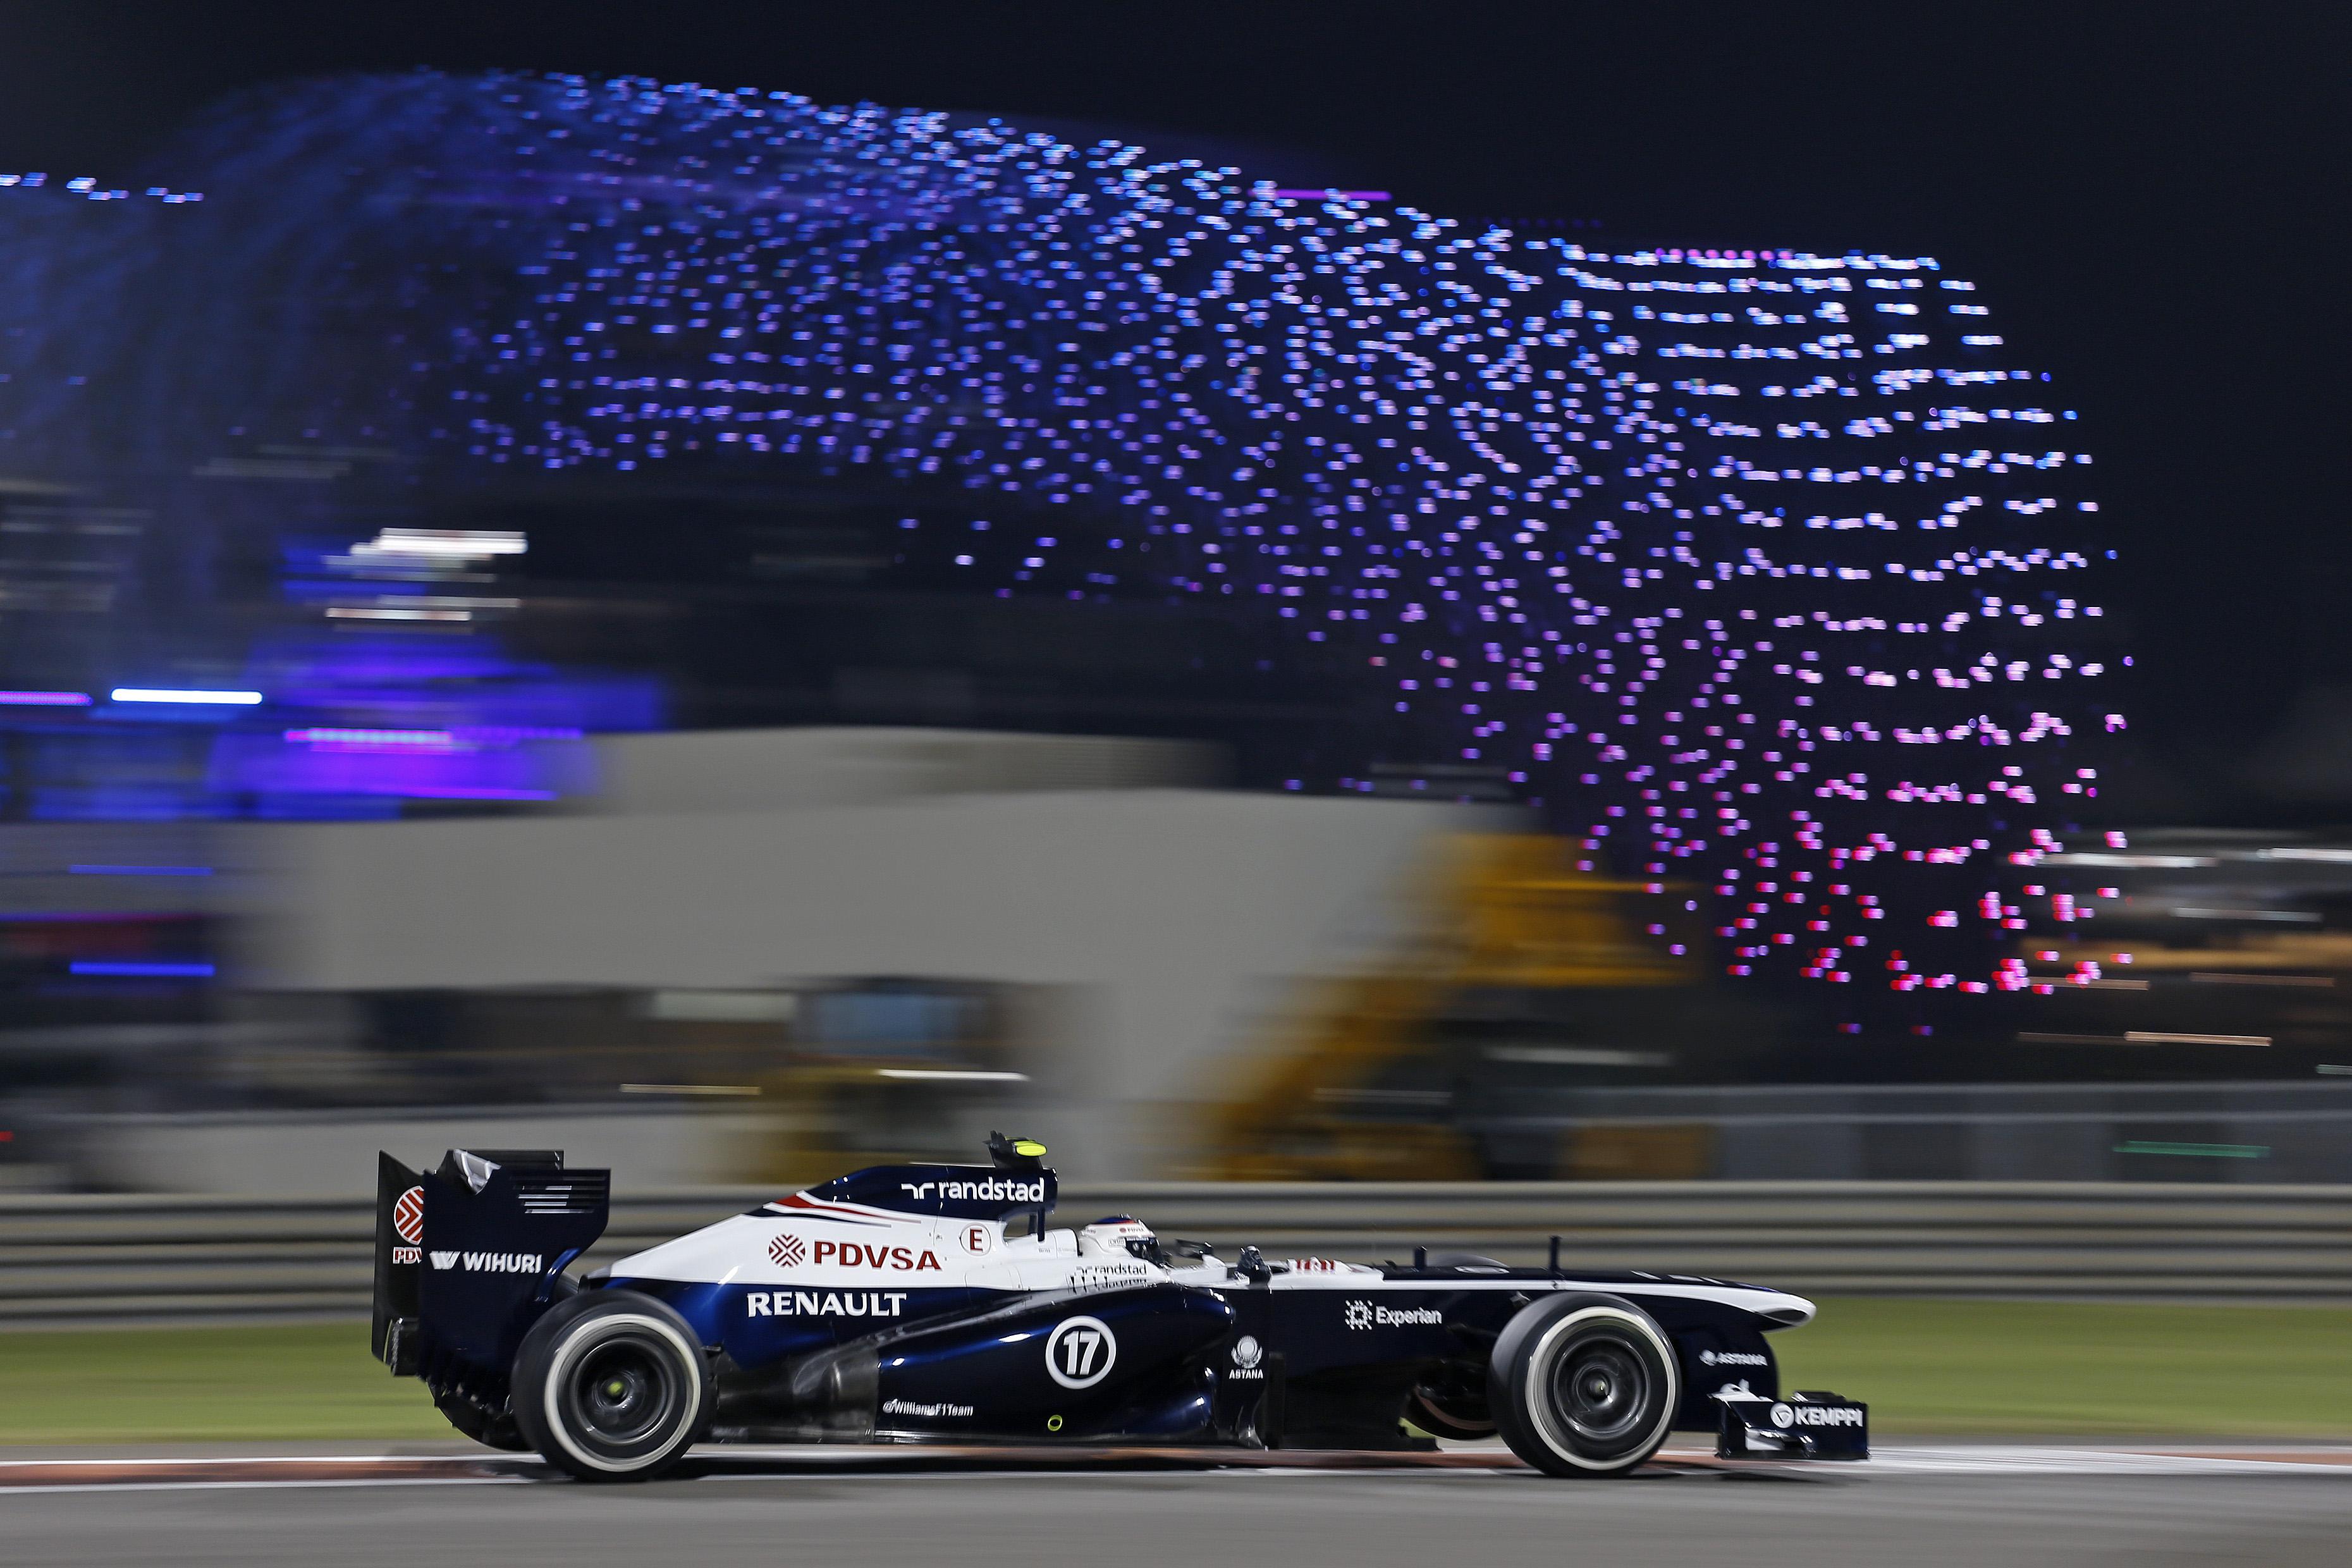 F1 2013 - Abu Dhabi Grand Prix